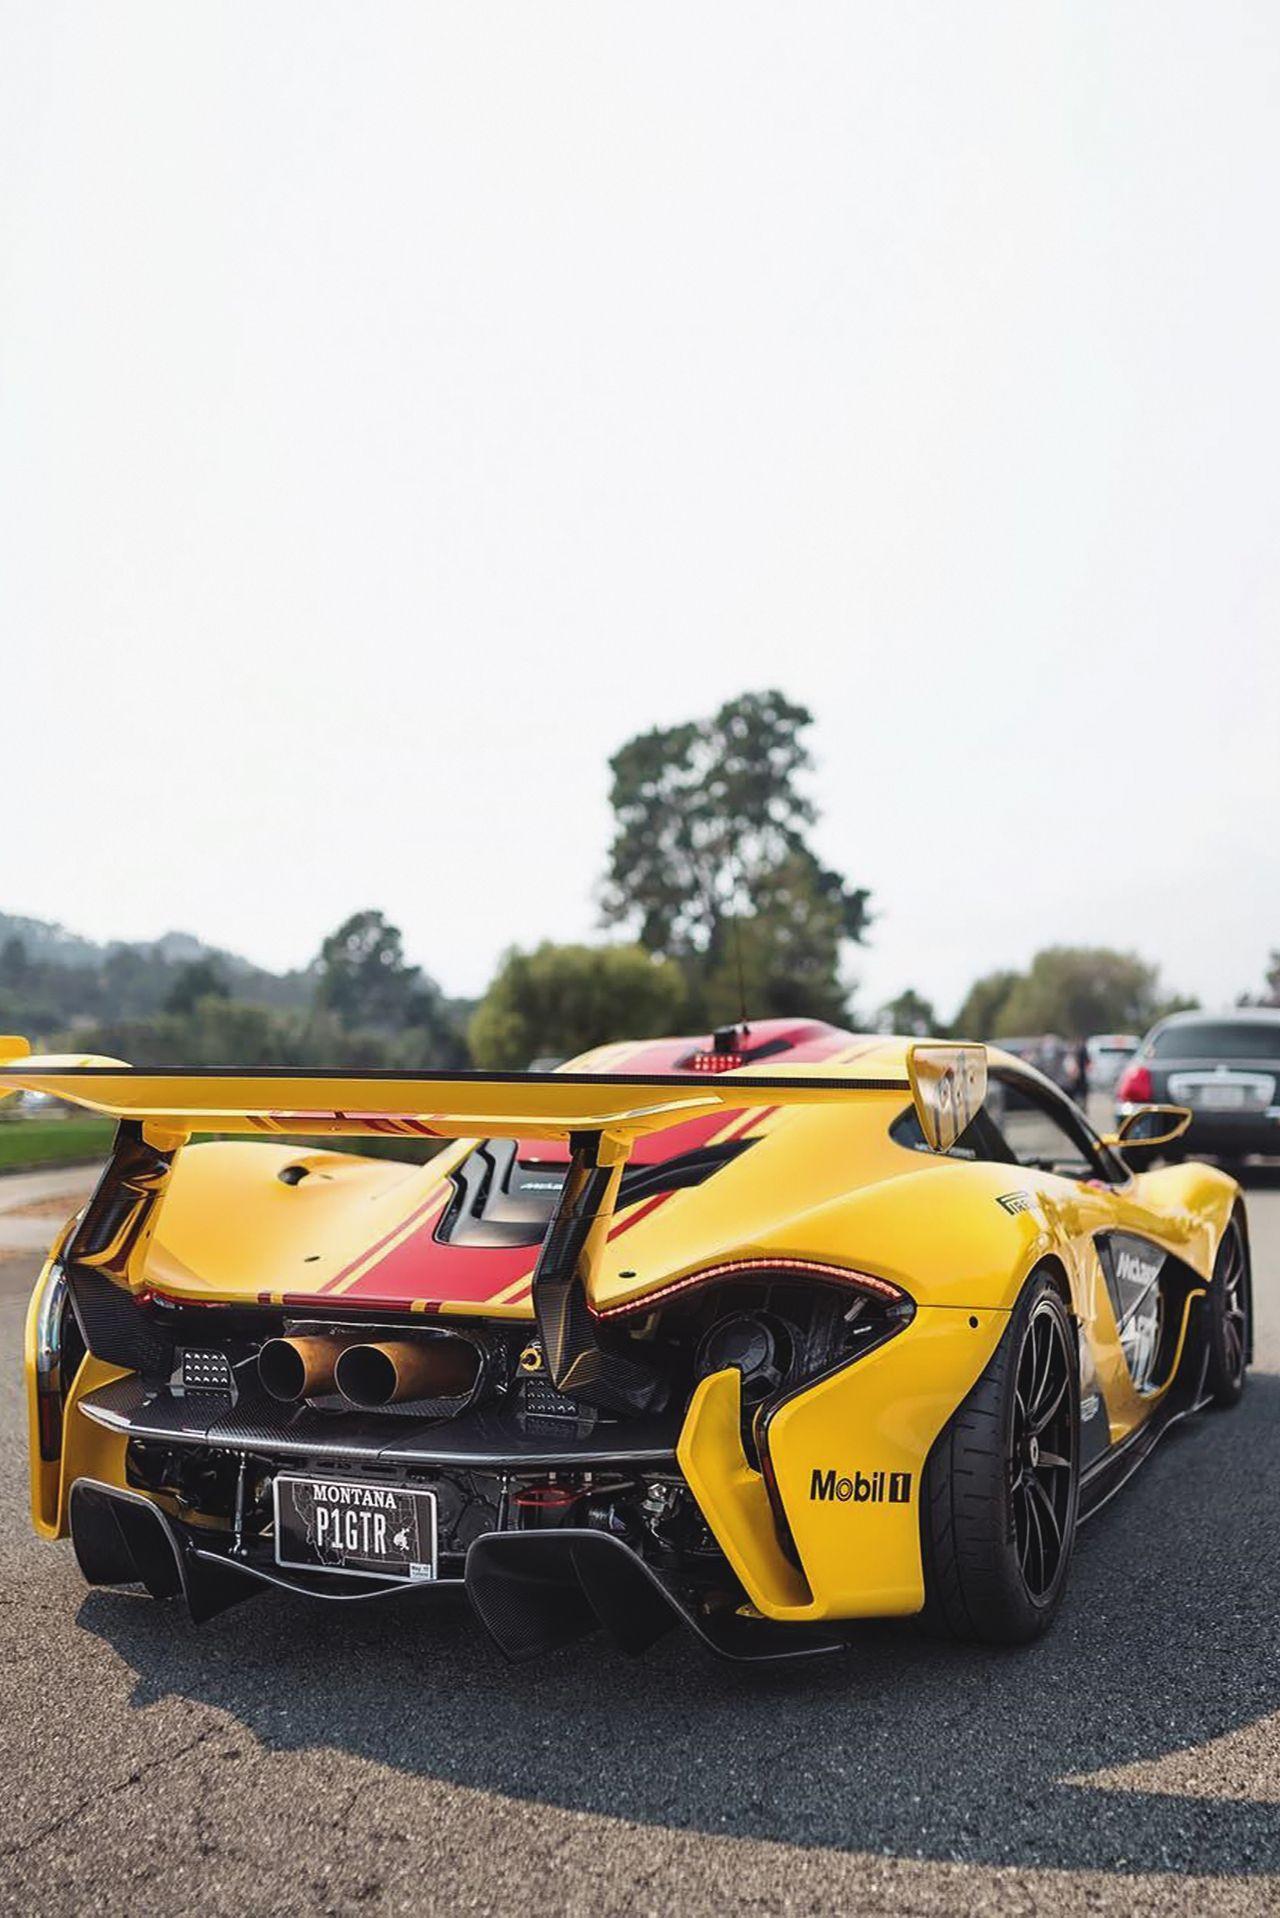 Super Car Crash Compilation Luxury Car Crashes And Accidents 1